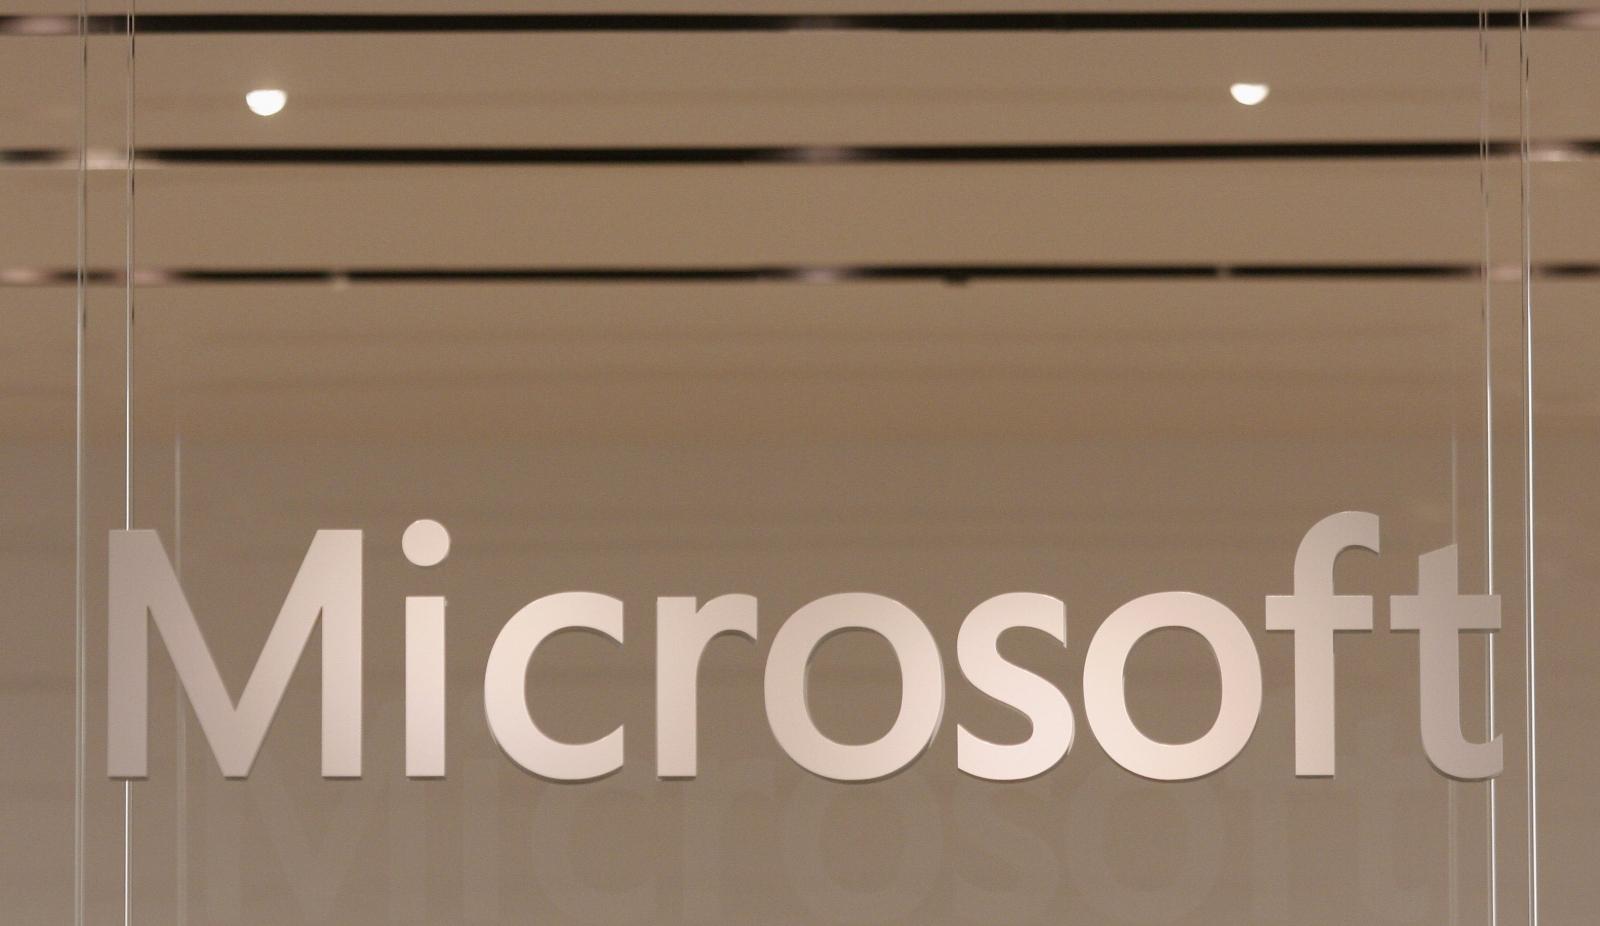 Microsoft and Adobe to share sales,marketing data